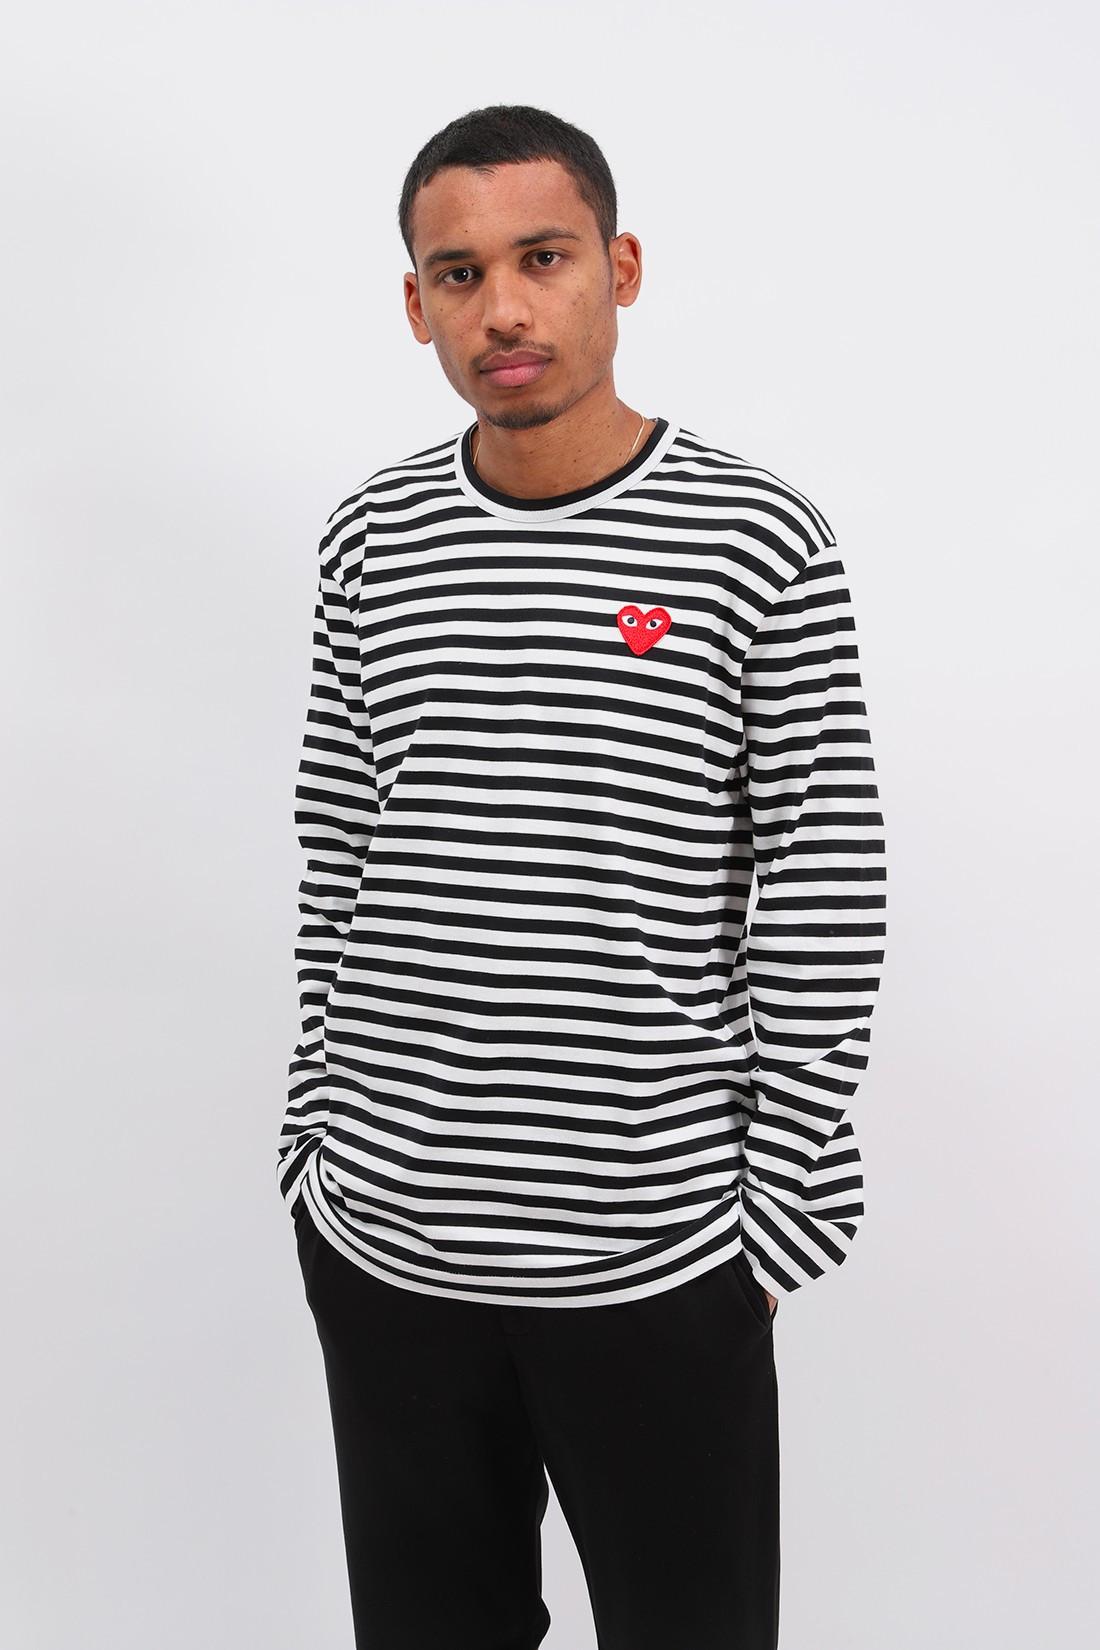 COMME DES GARÇONS PLAY / Play striped t-shirt Black white